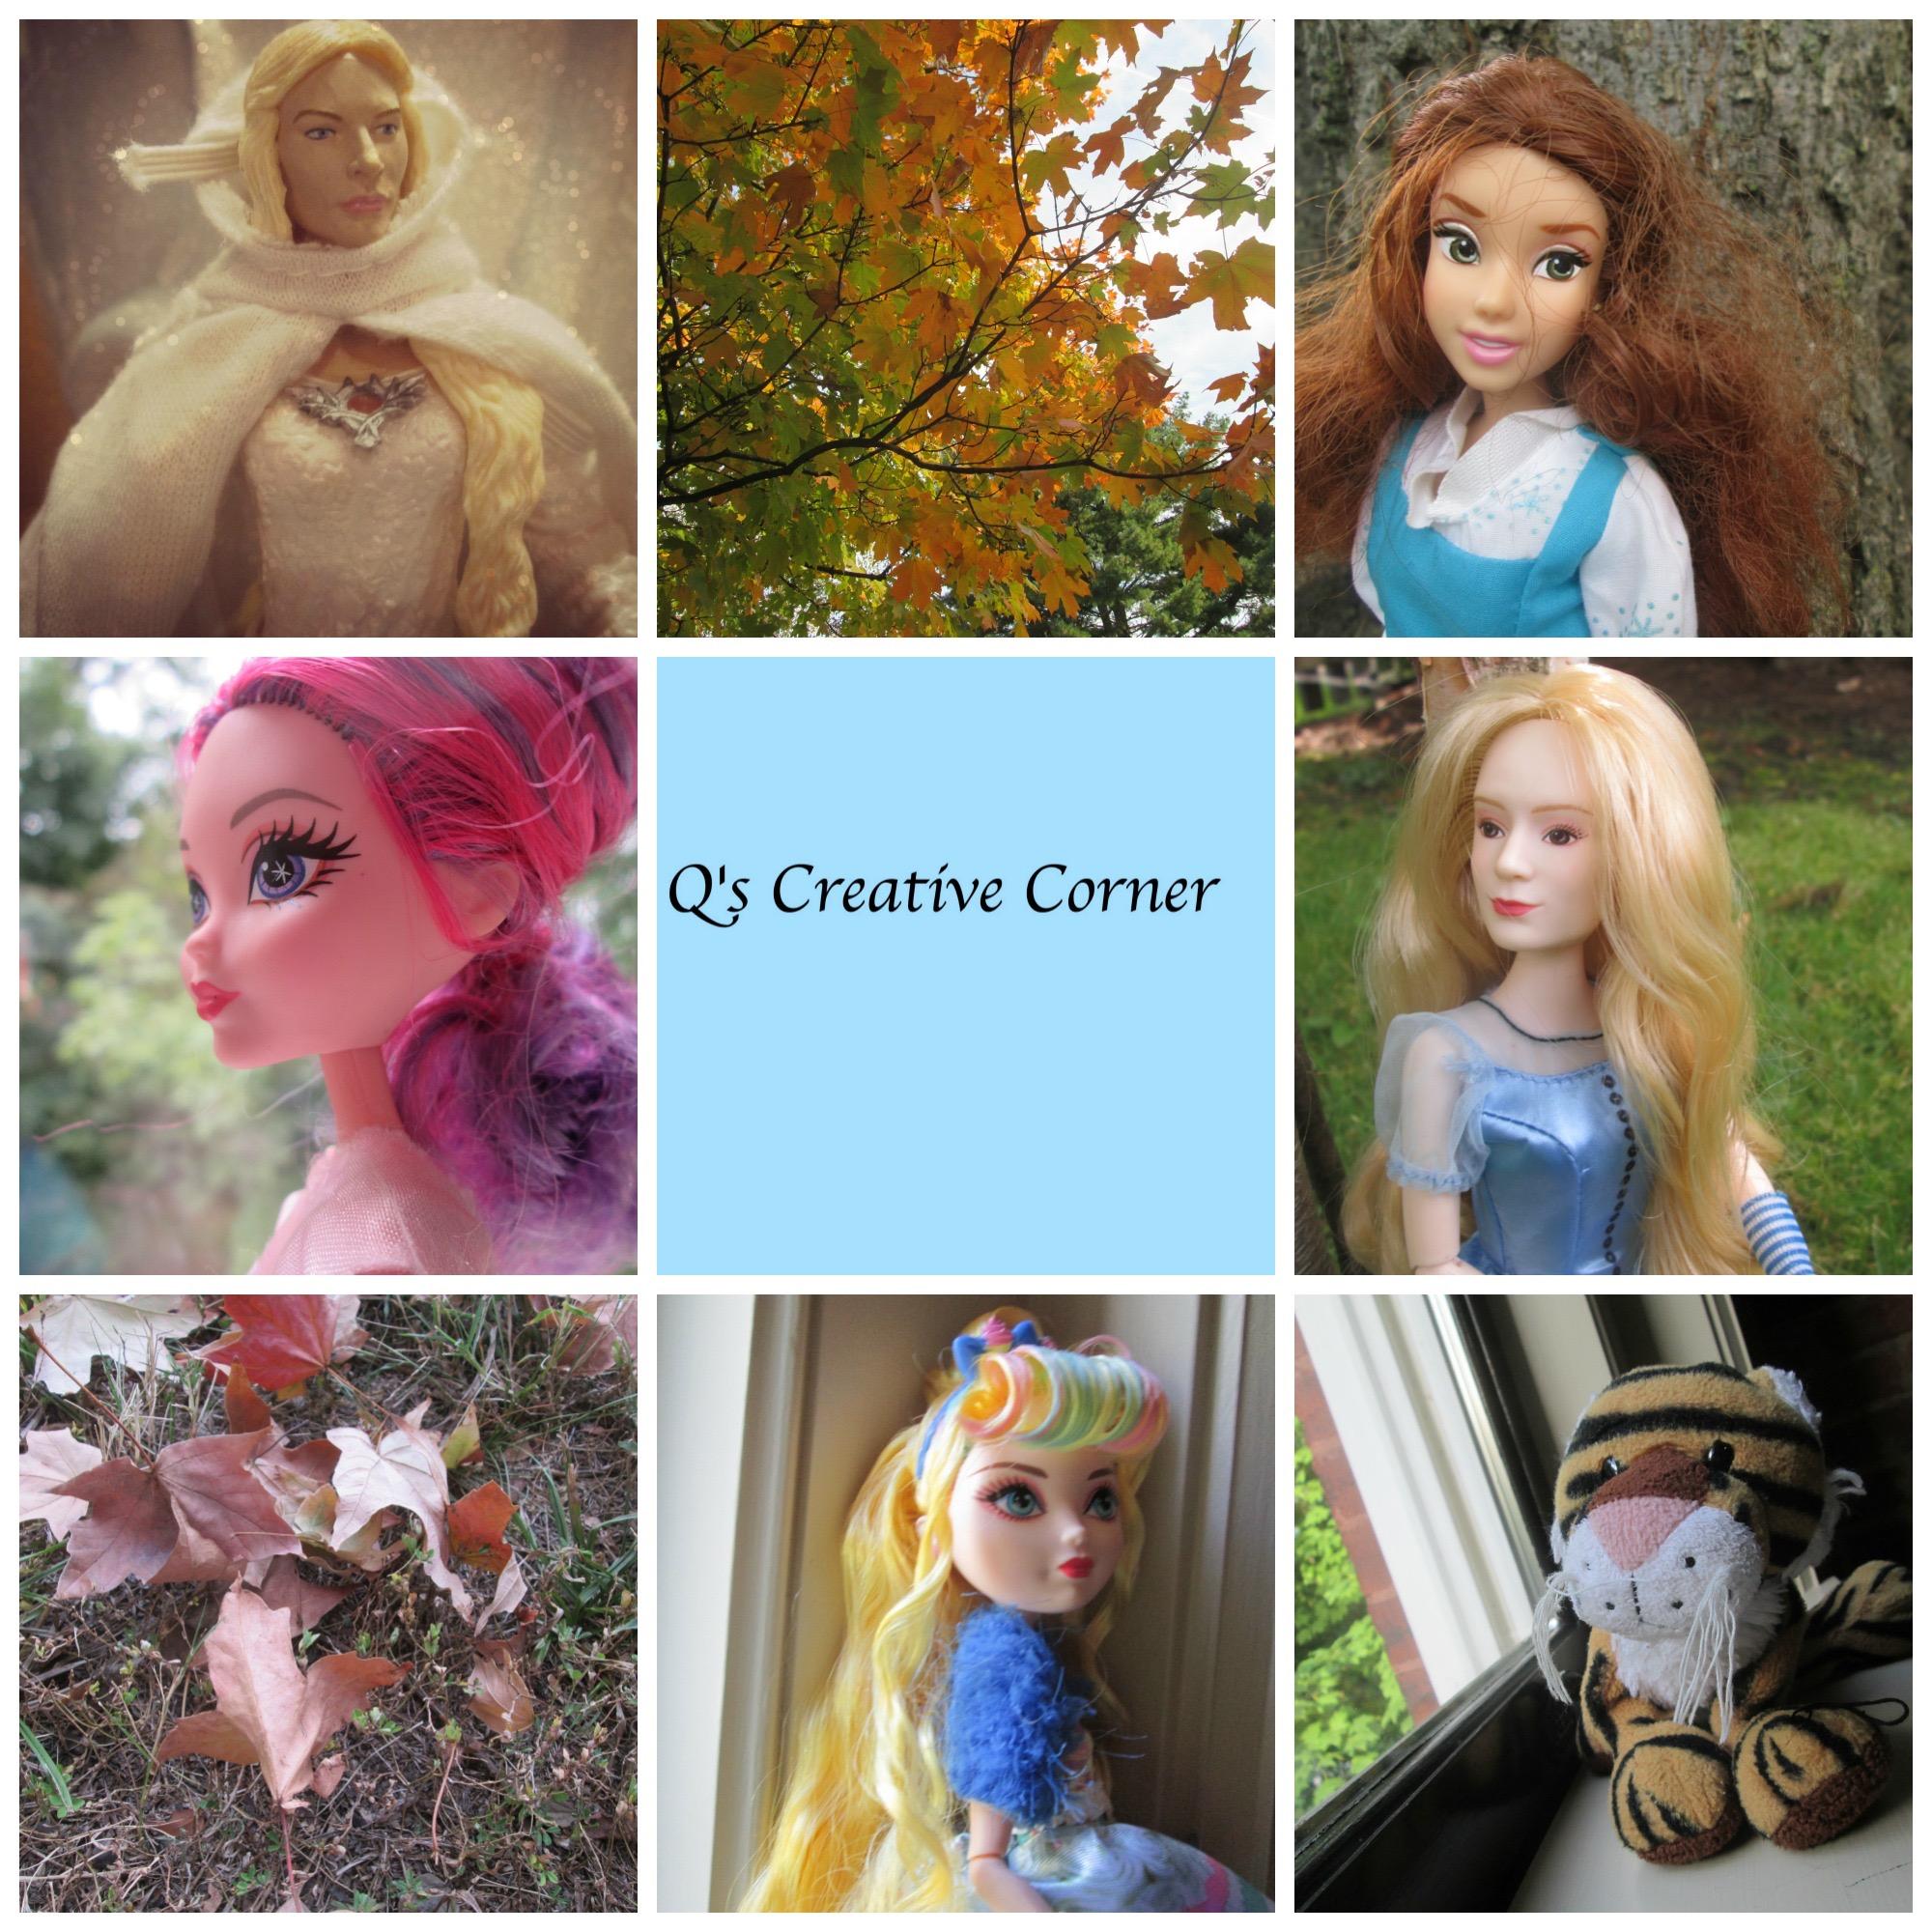 Q's Creative Corner